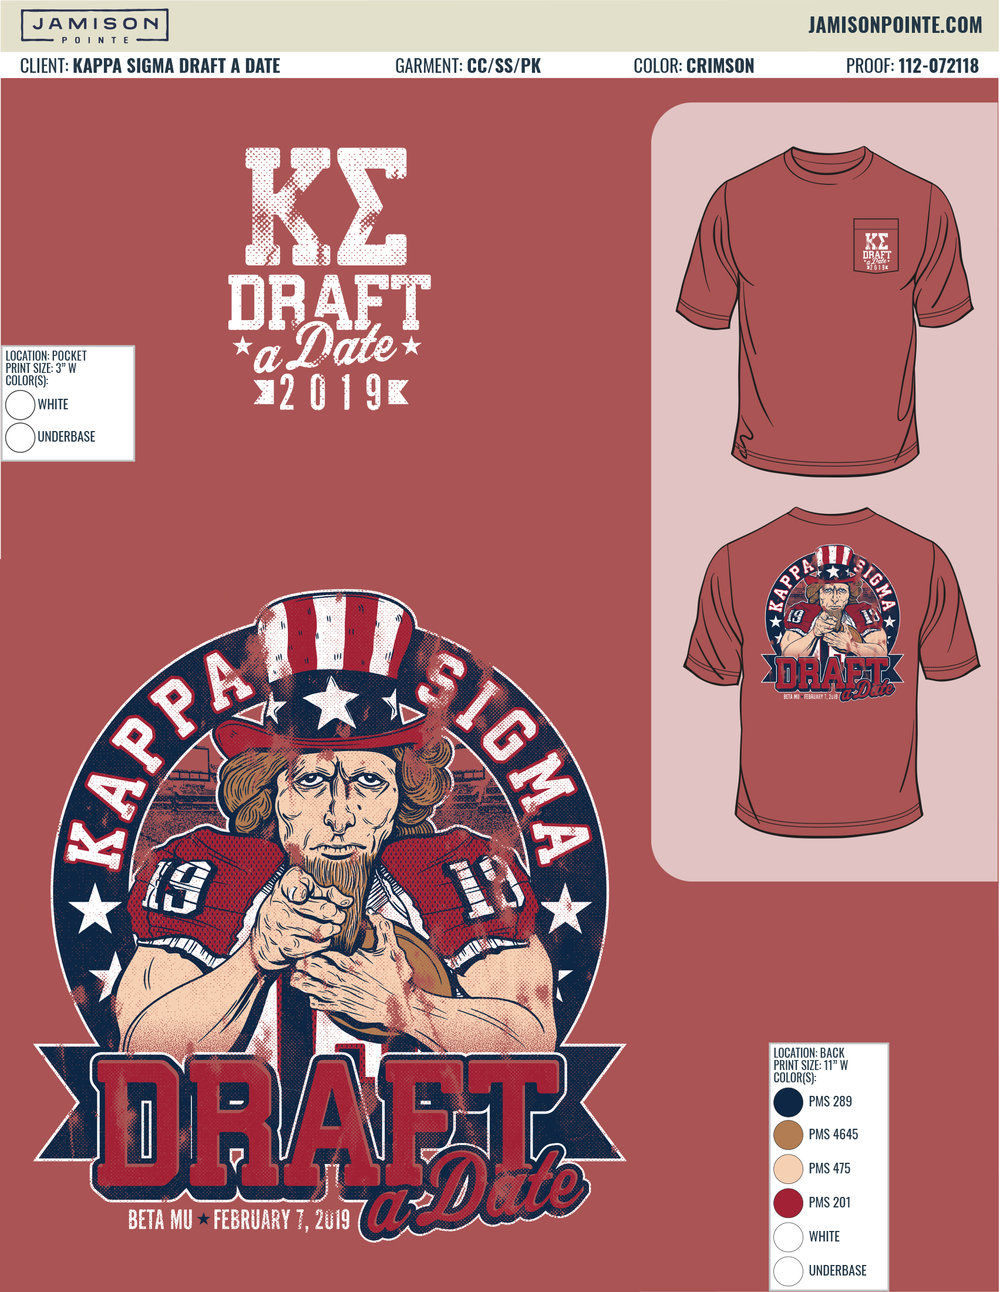 112-072118 Kappa Sigma Draft a Date.jpg